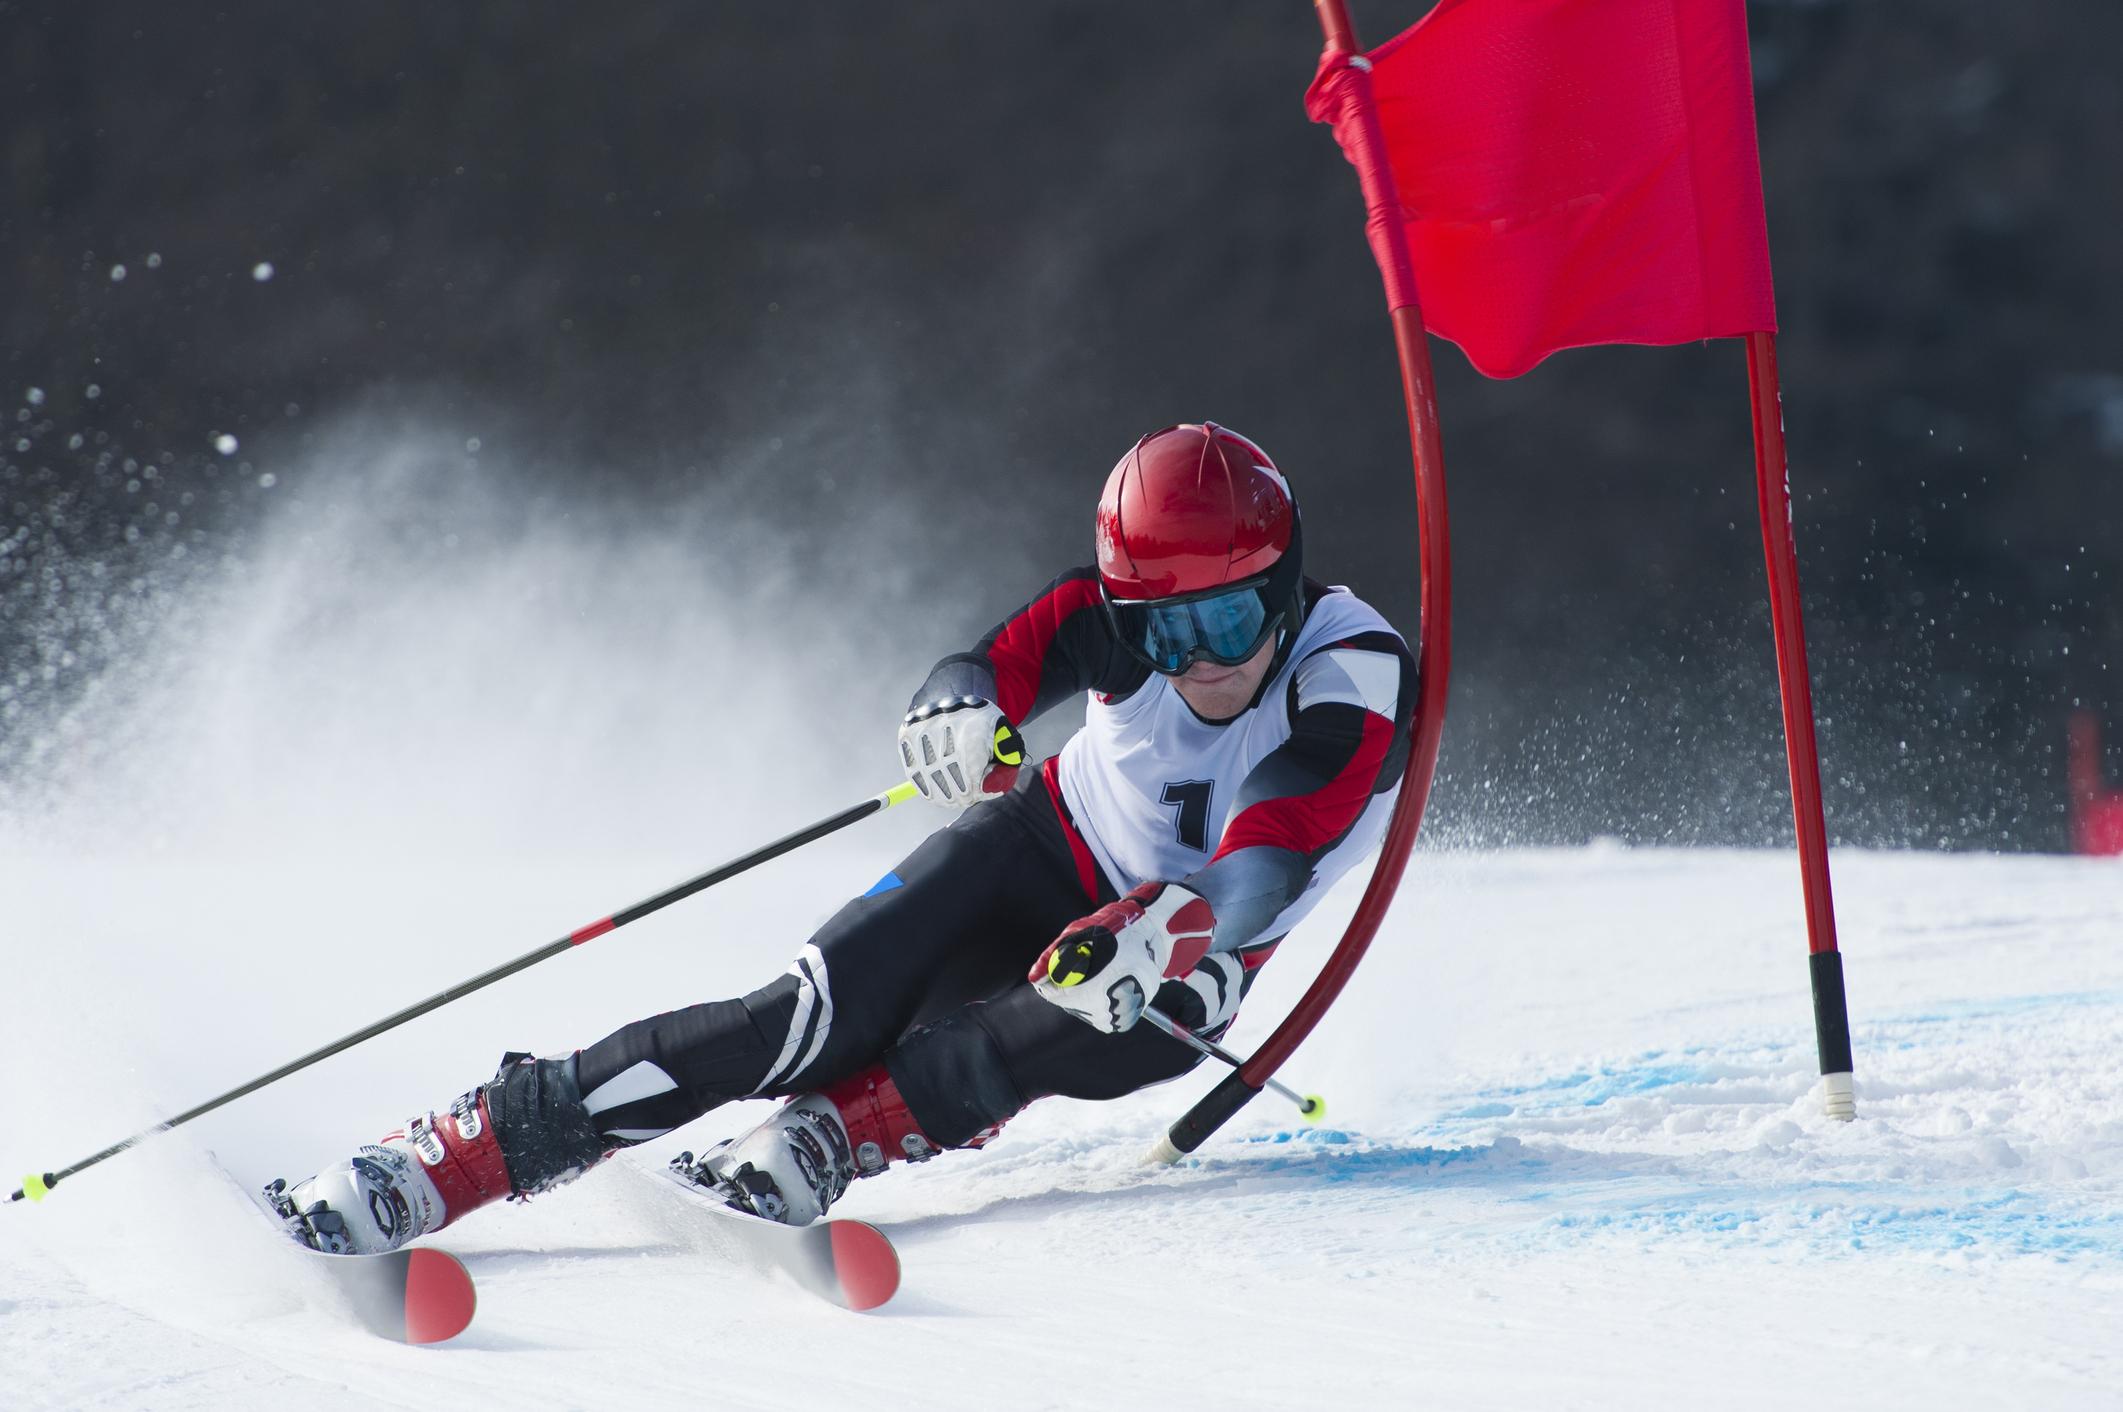 Ski og staver Image